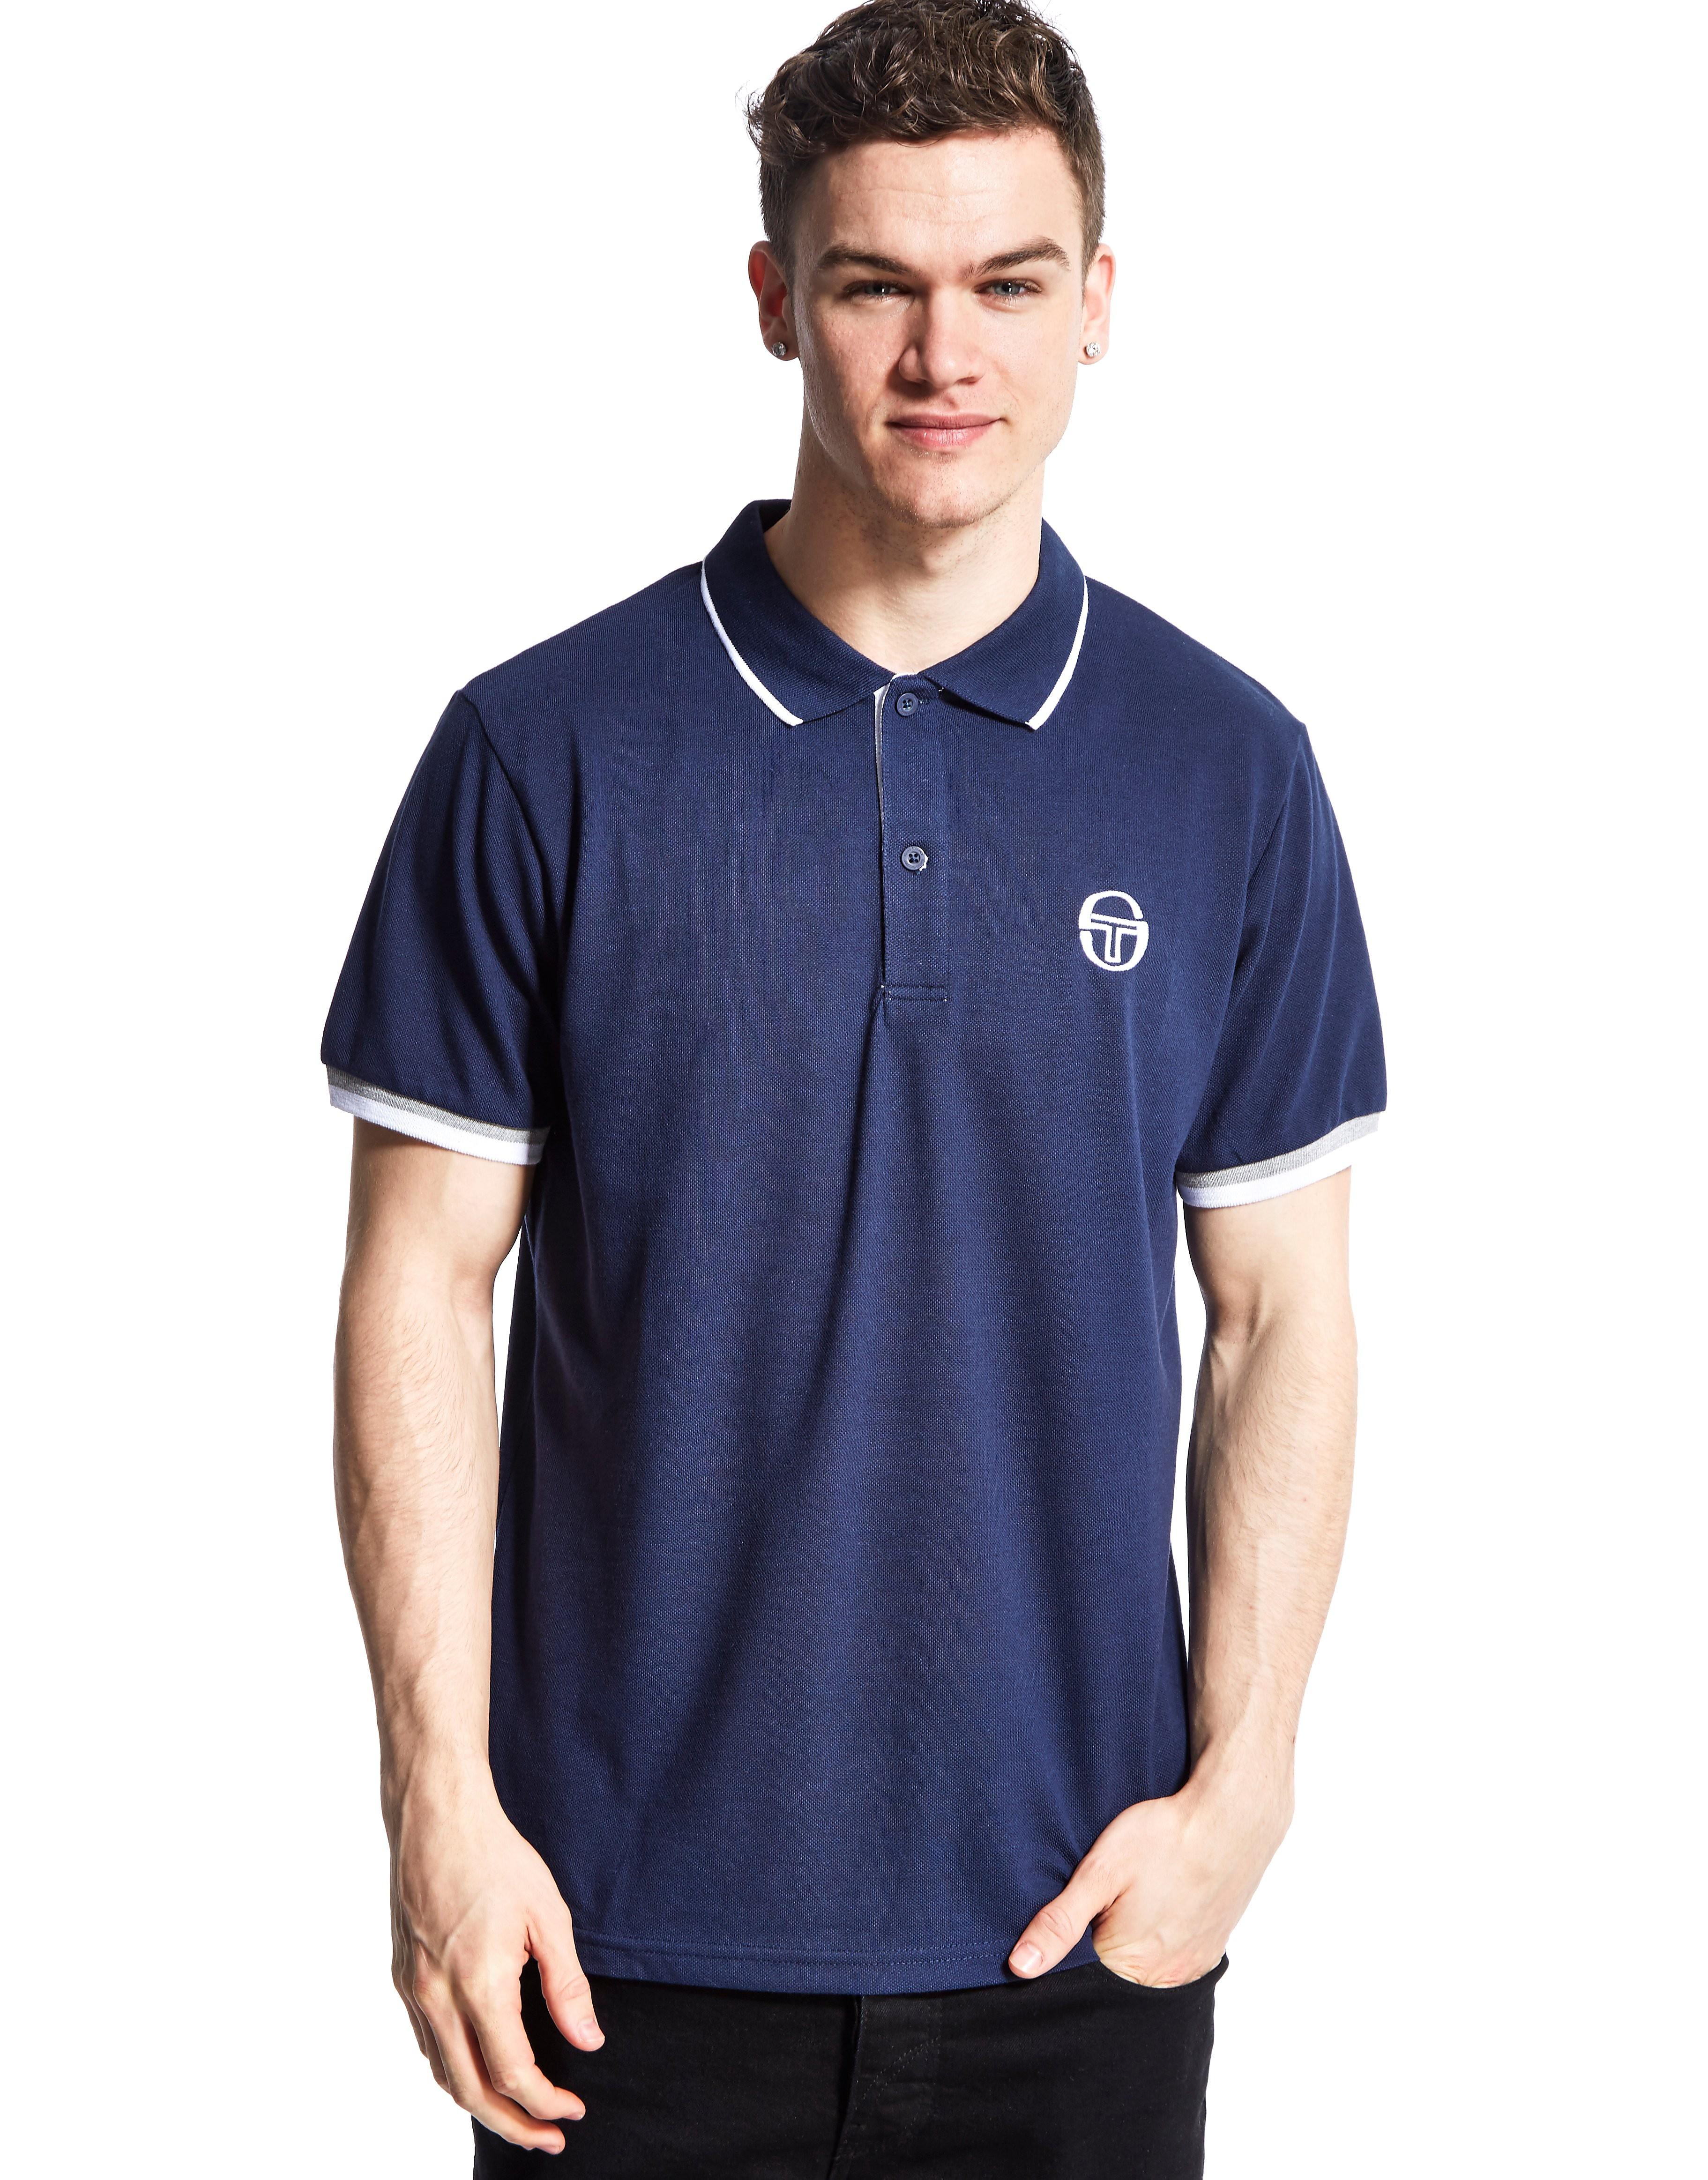 Sergio Tacchini Stanway Tip Polo Shirt